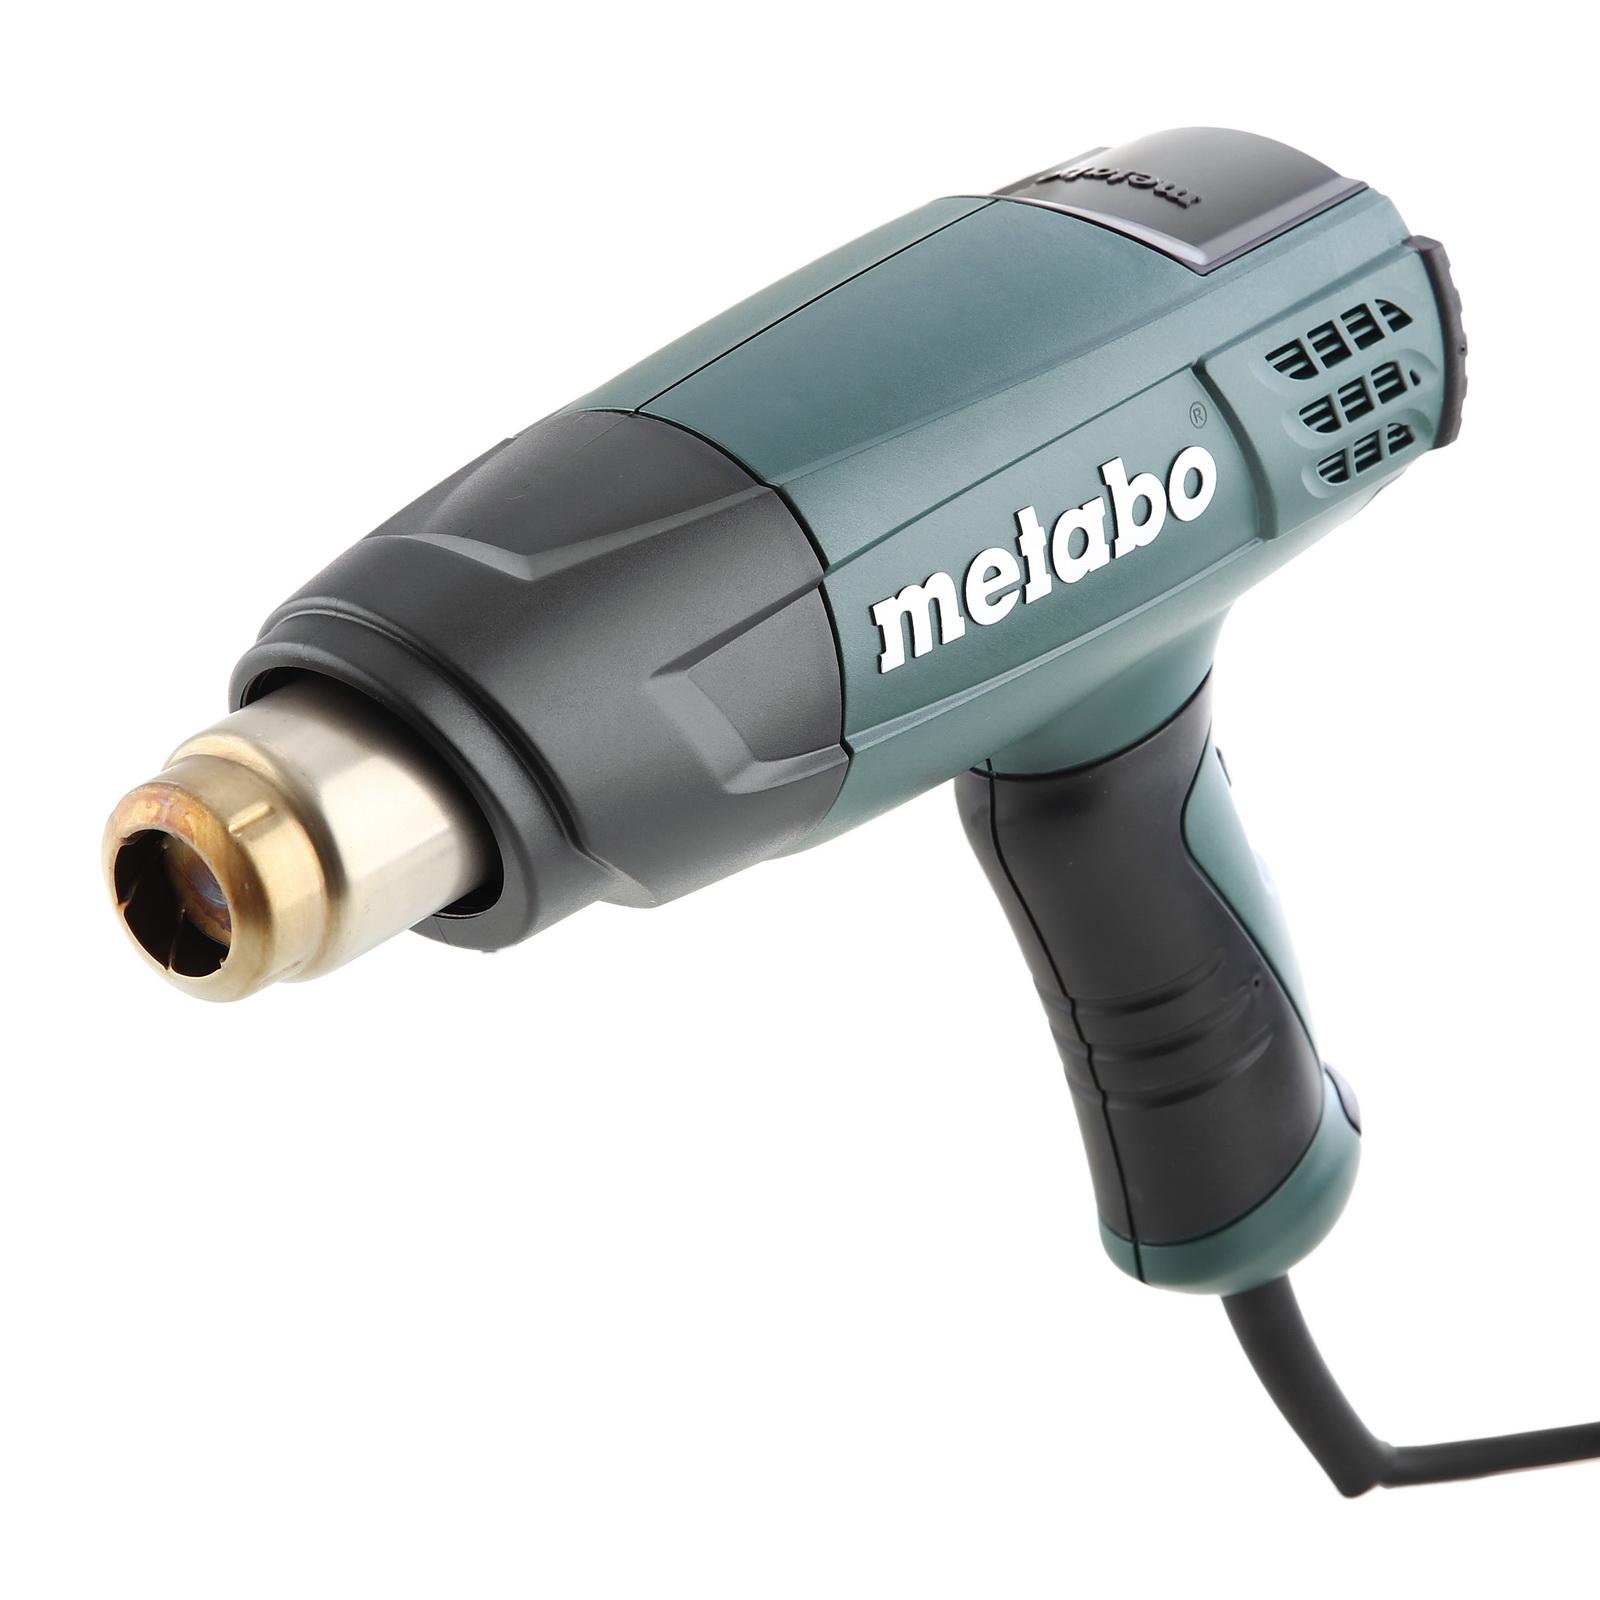 Фен технический Metabo He 23-650 control (602365500) цены